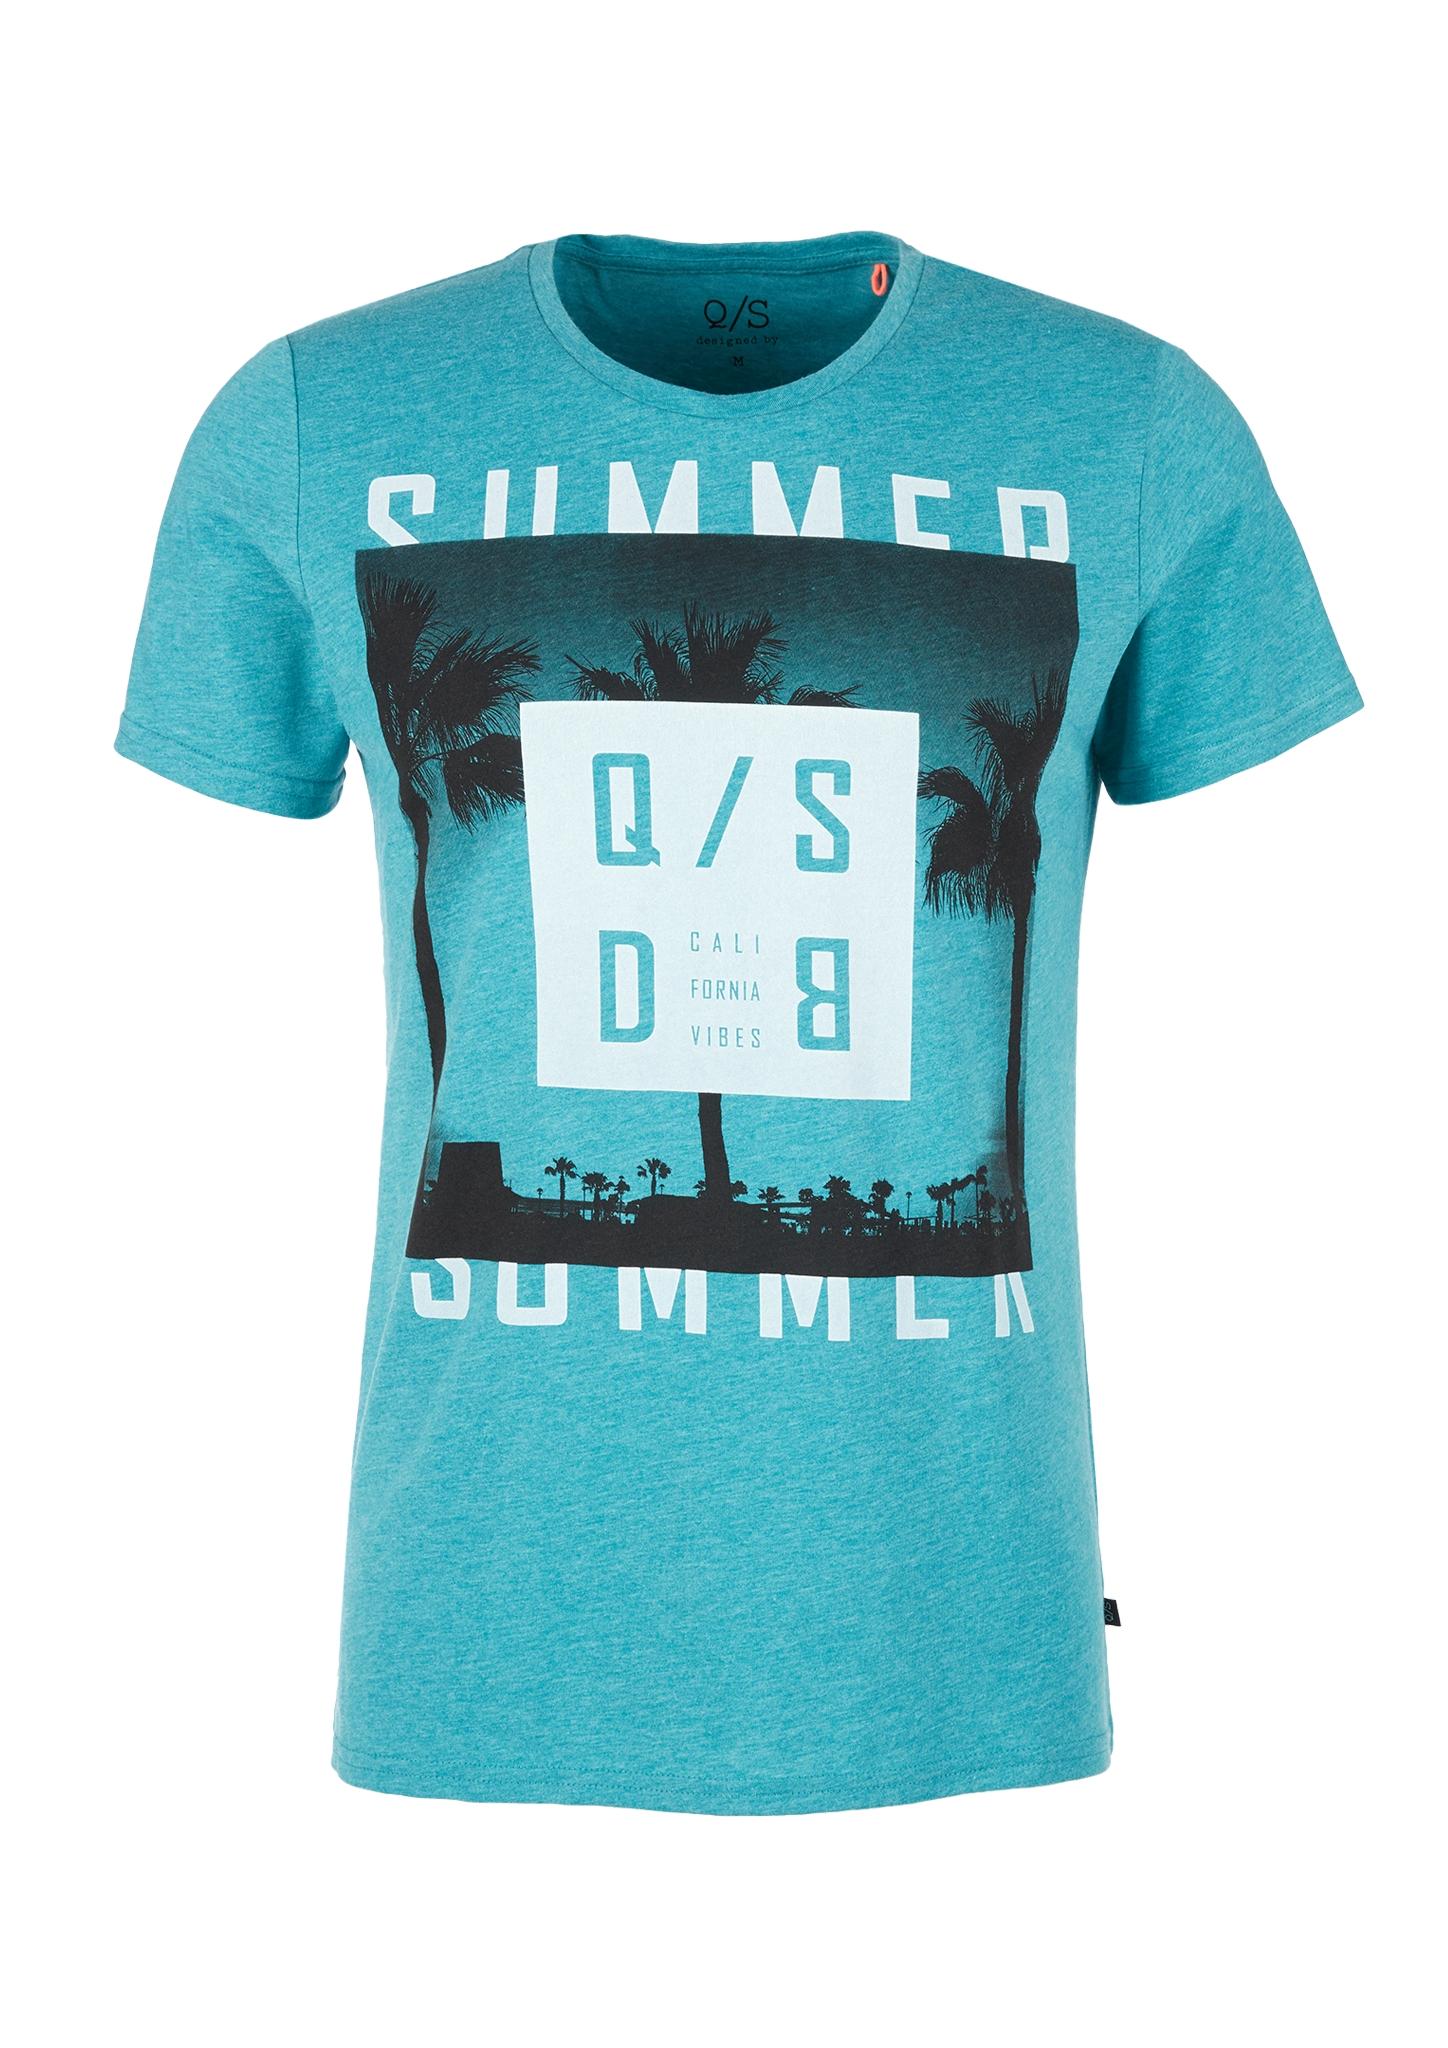 T-Shirt | Bekleidung > Shirts > Sonstige Shirts | Blau | 65% polyester -  35% baumwolle | Q/S designed by